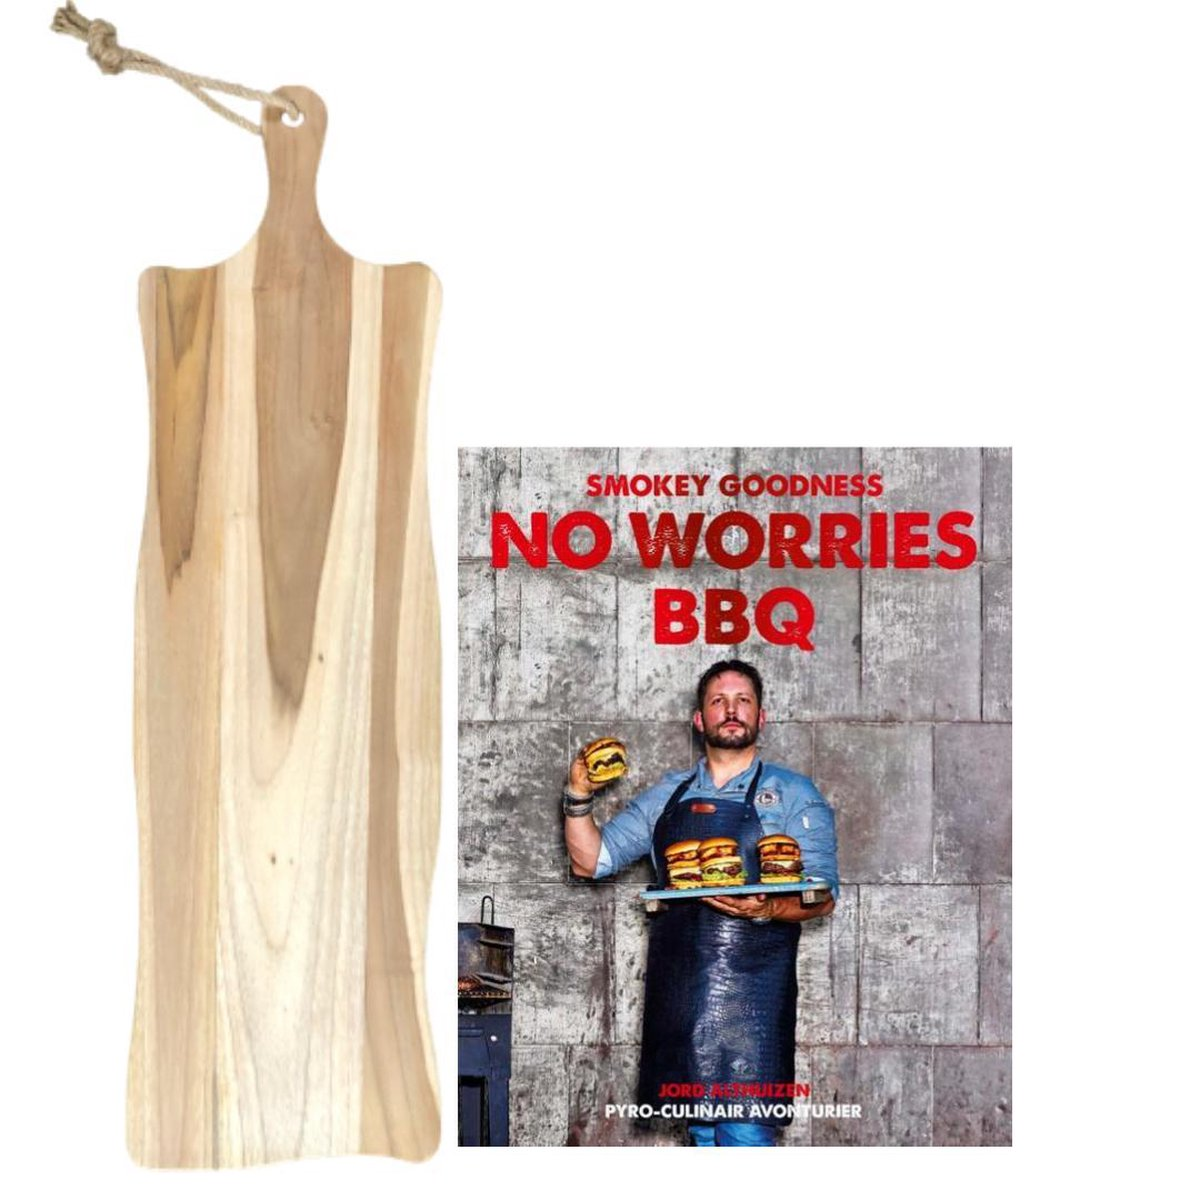 Mannen cadeaupakket - BBQ boek - houten plank - Smokey Goodness - No Worries BBQ - hamburgers kookboek - Vaderdag geschenk - mannen cadeautjes geschenkset - mannen cadeautjes - snijplank groot - cadeau man verjaardag